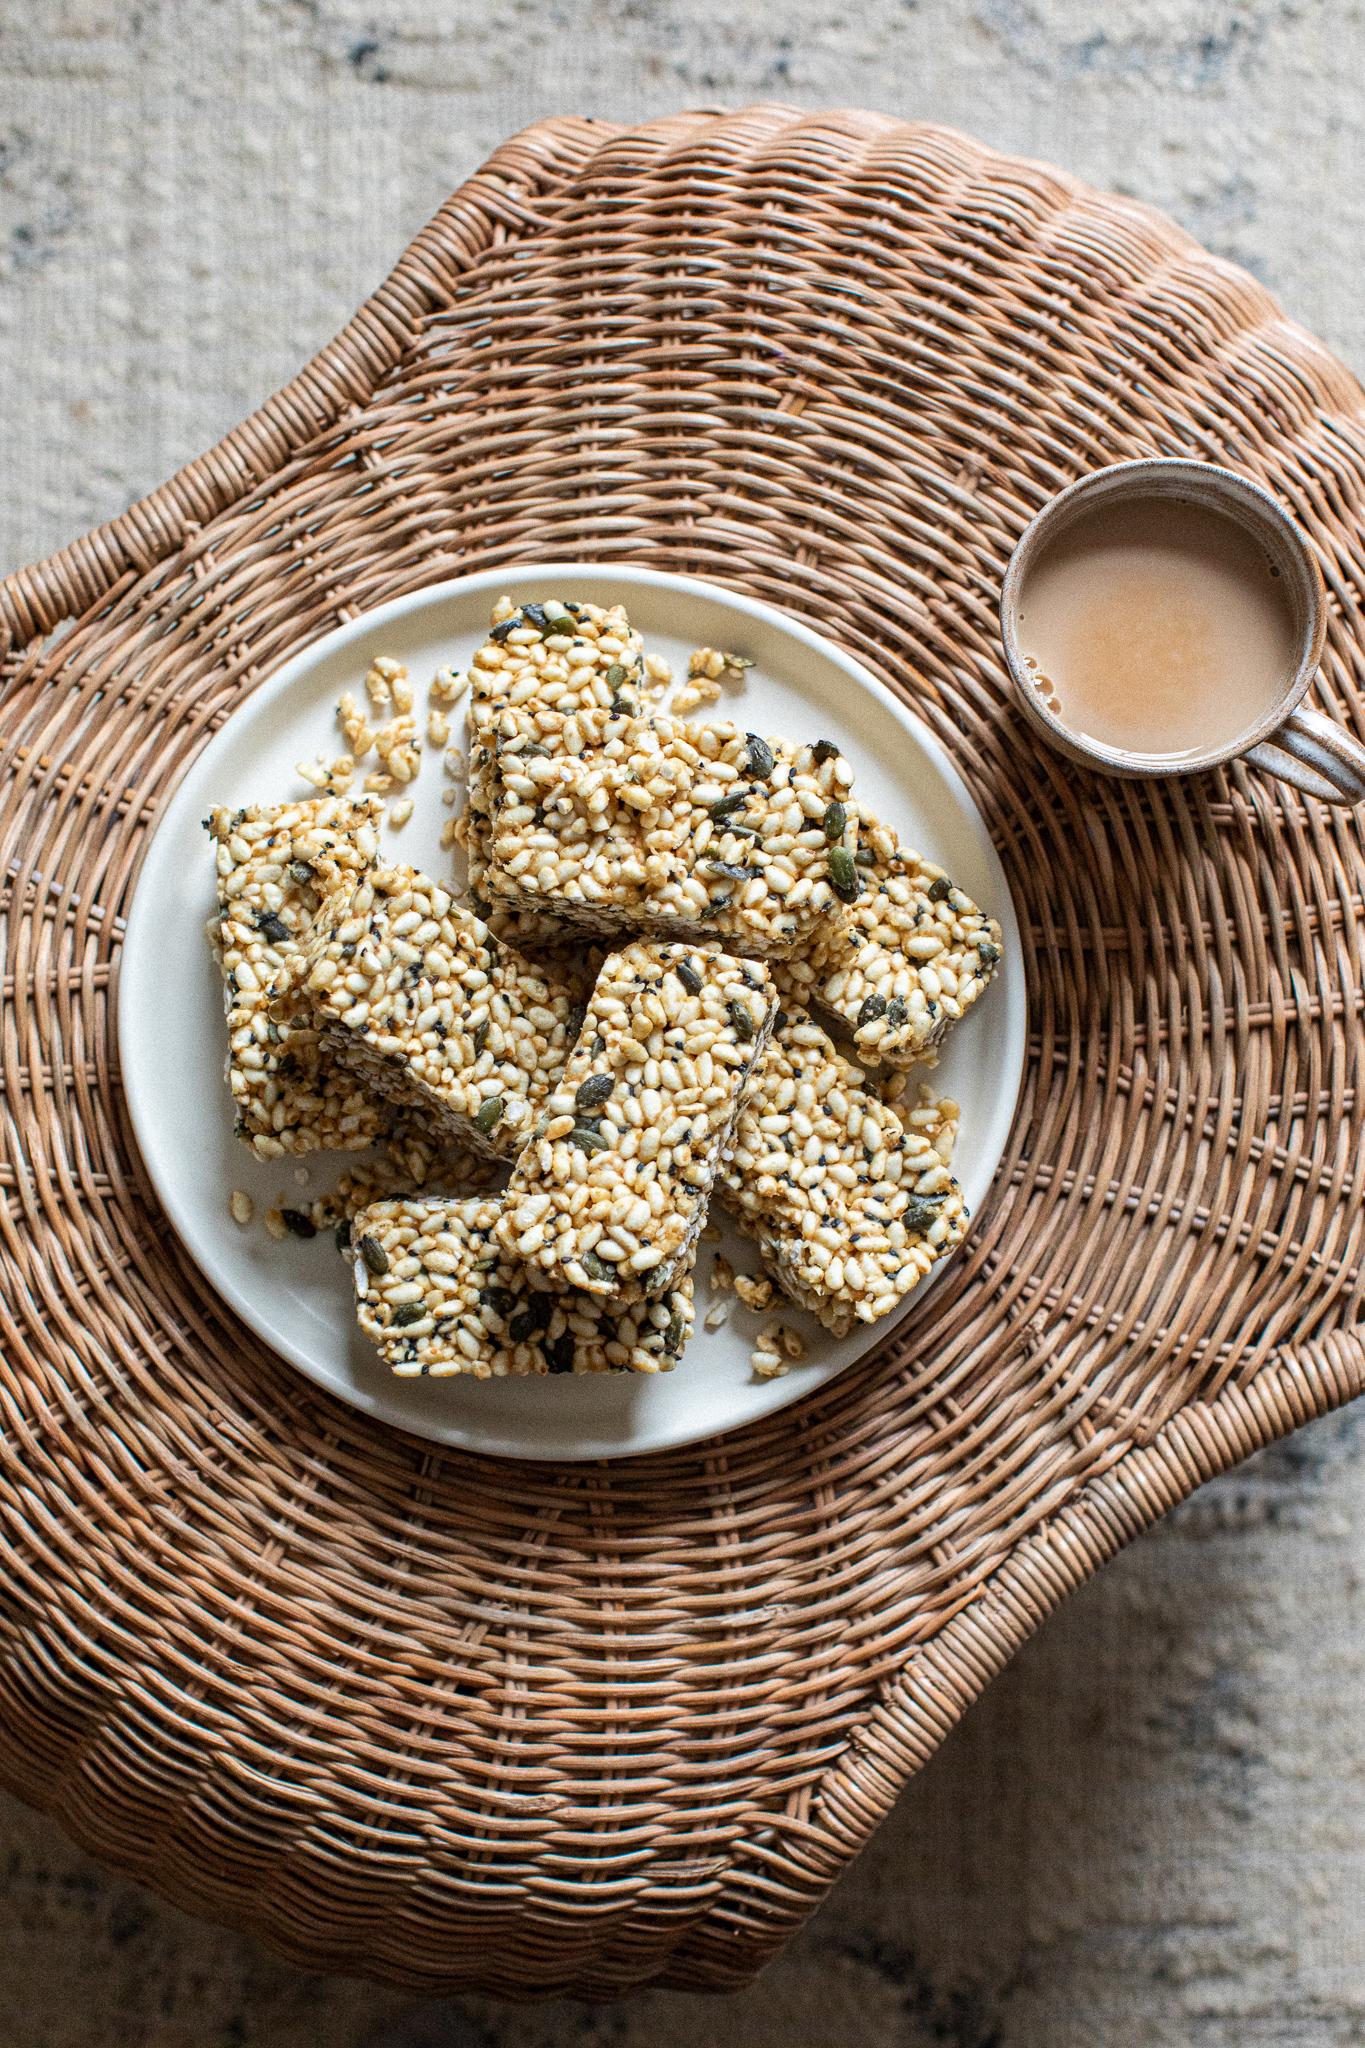 Low FODMAP peanut butter rice crispy bars